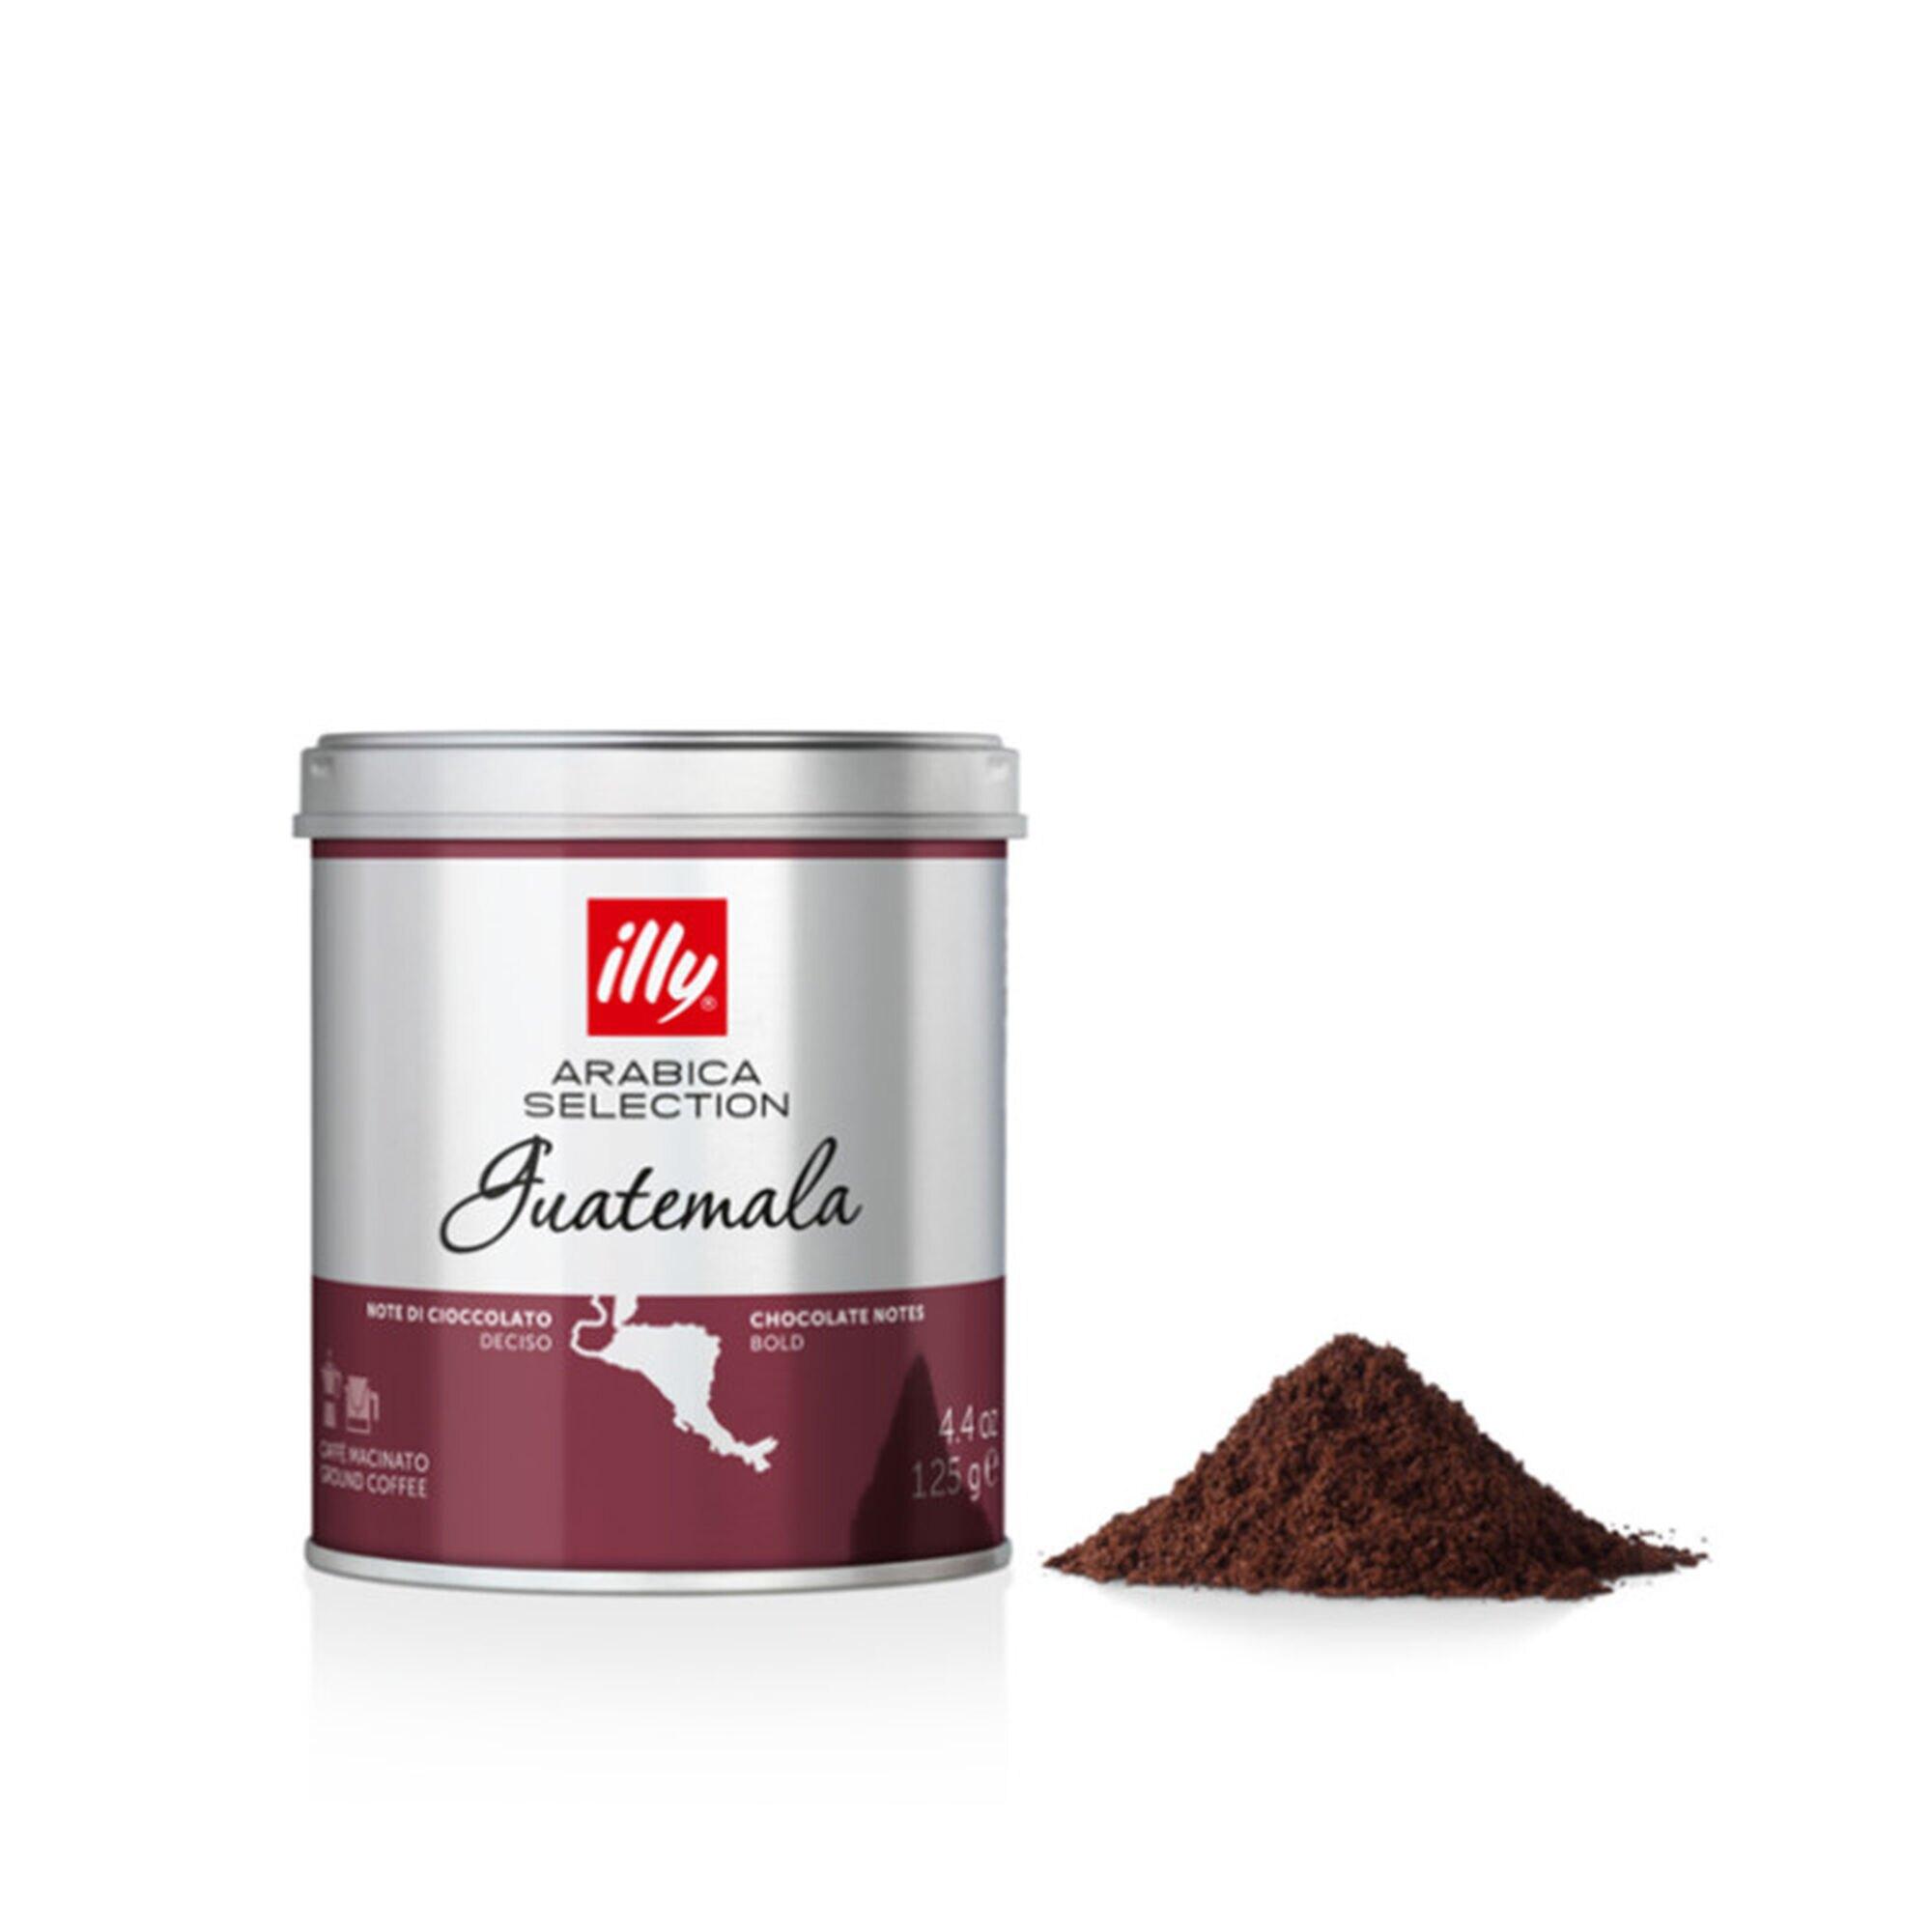 Caffè Macinato Moka Arabica Selection Guatemala - 125g - illy Shop